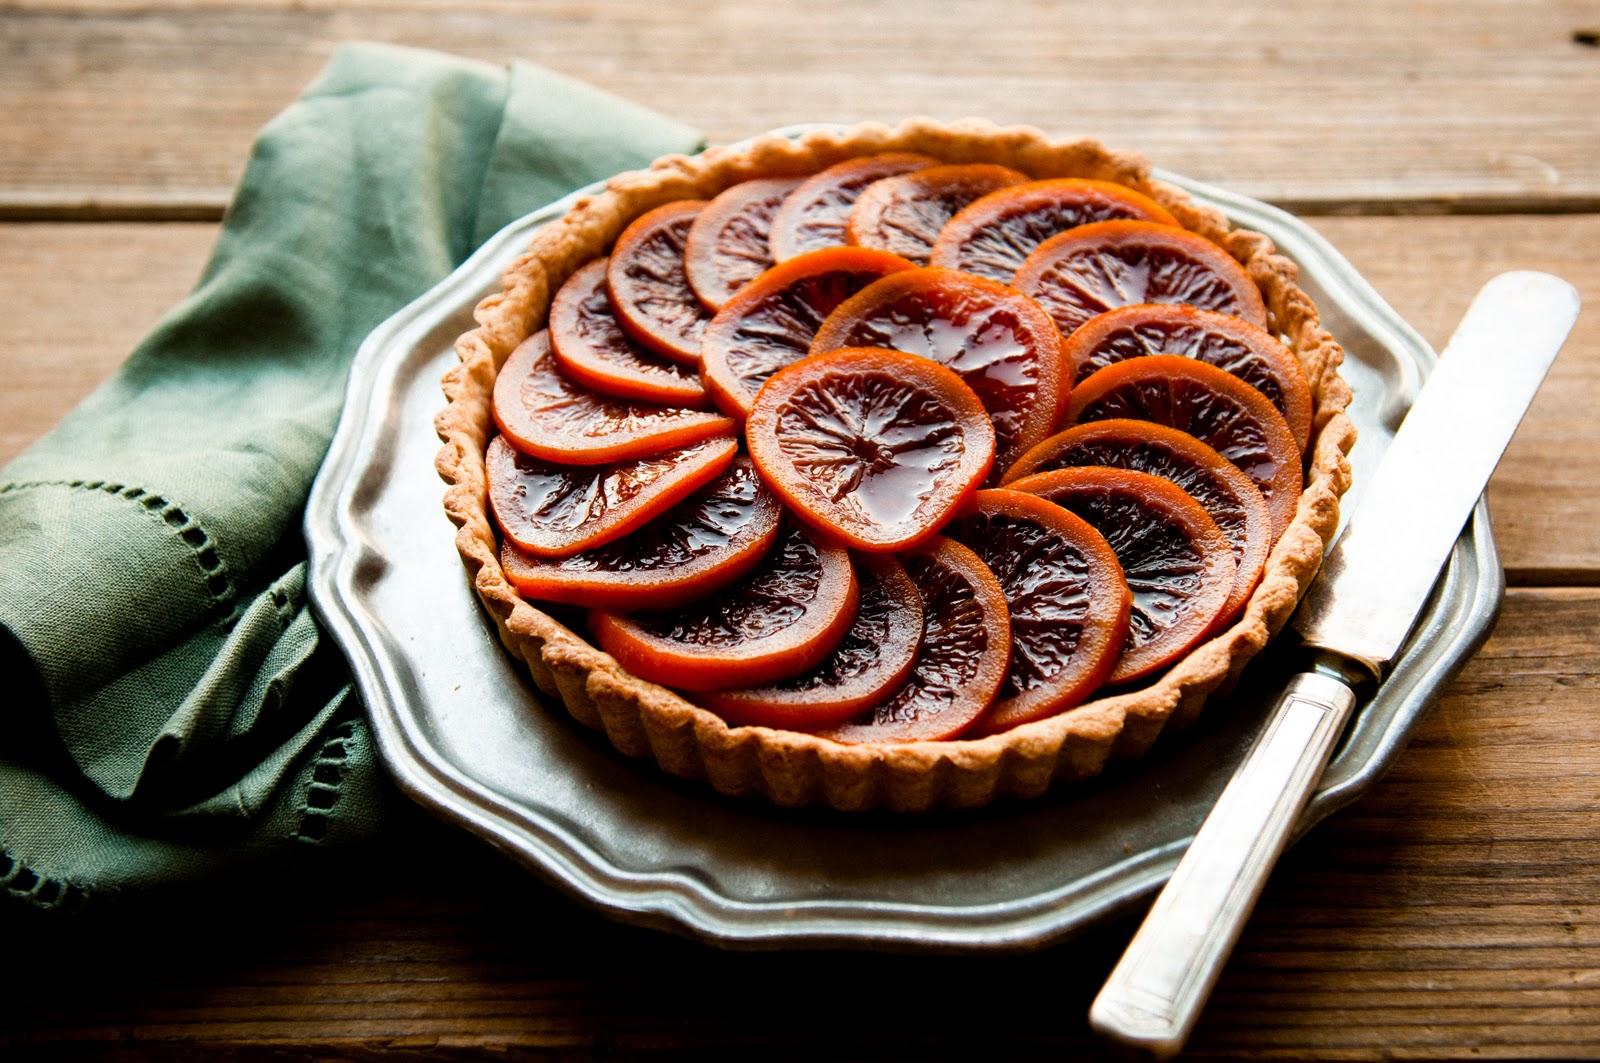 ... Breakfast: Blood orange honey-glazed five spice tart with almond cream